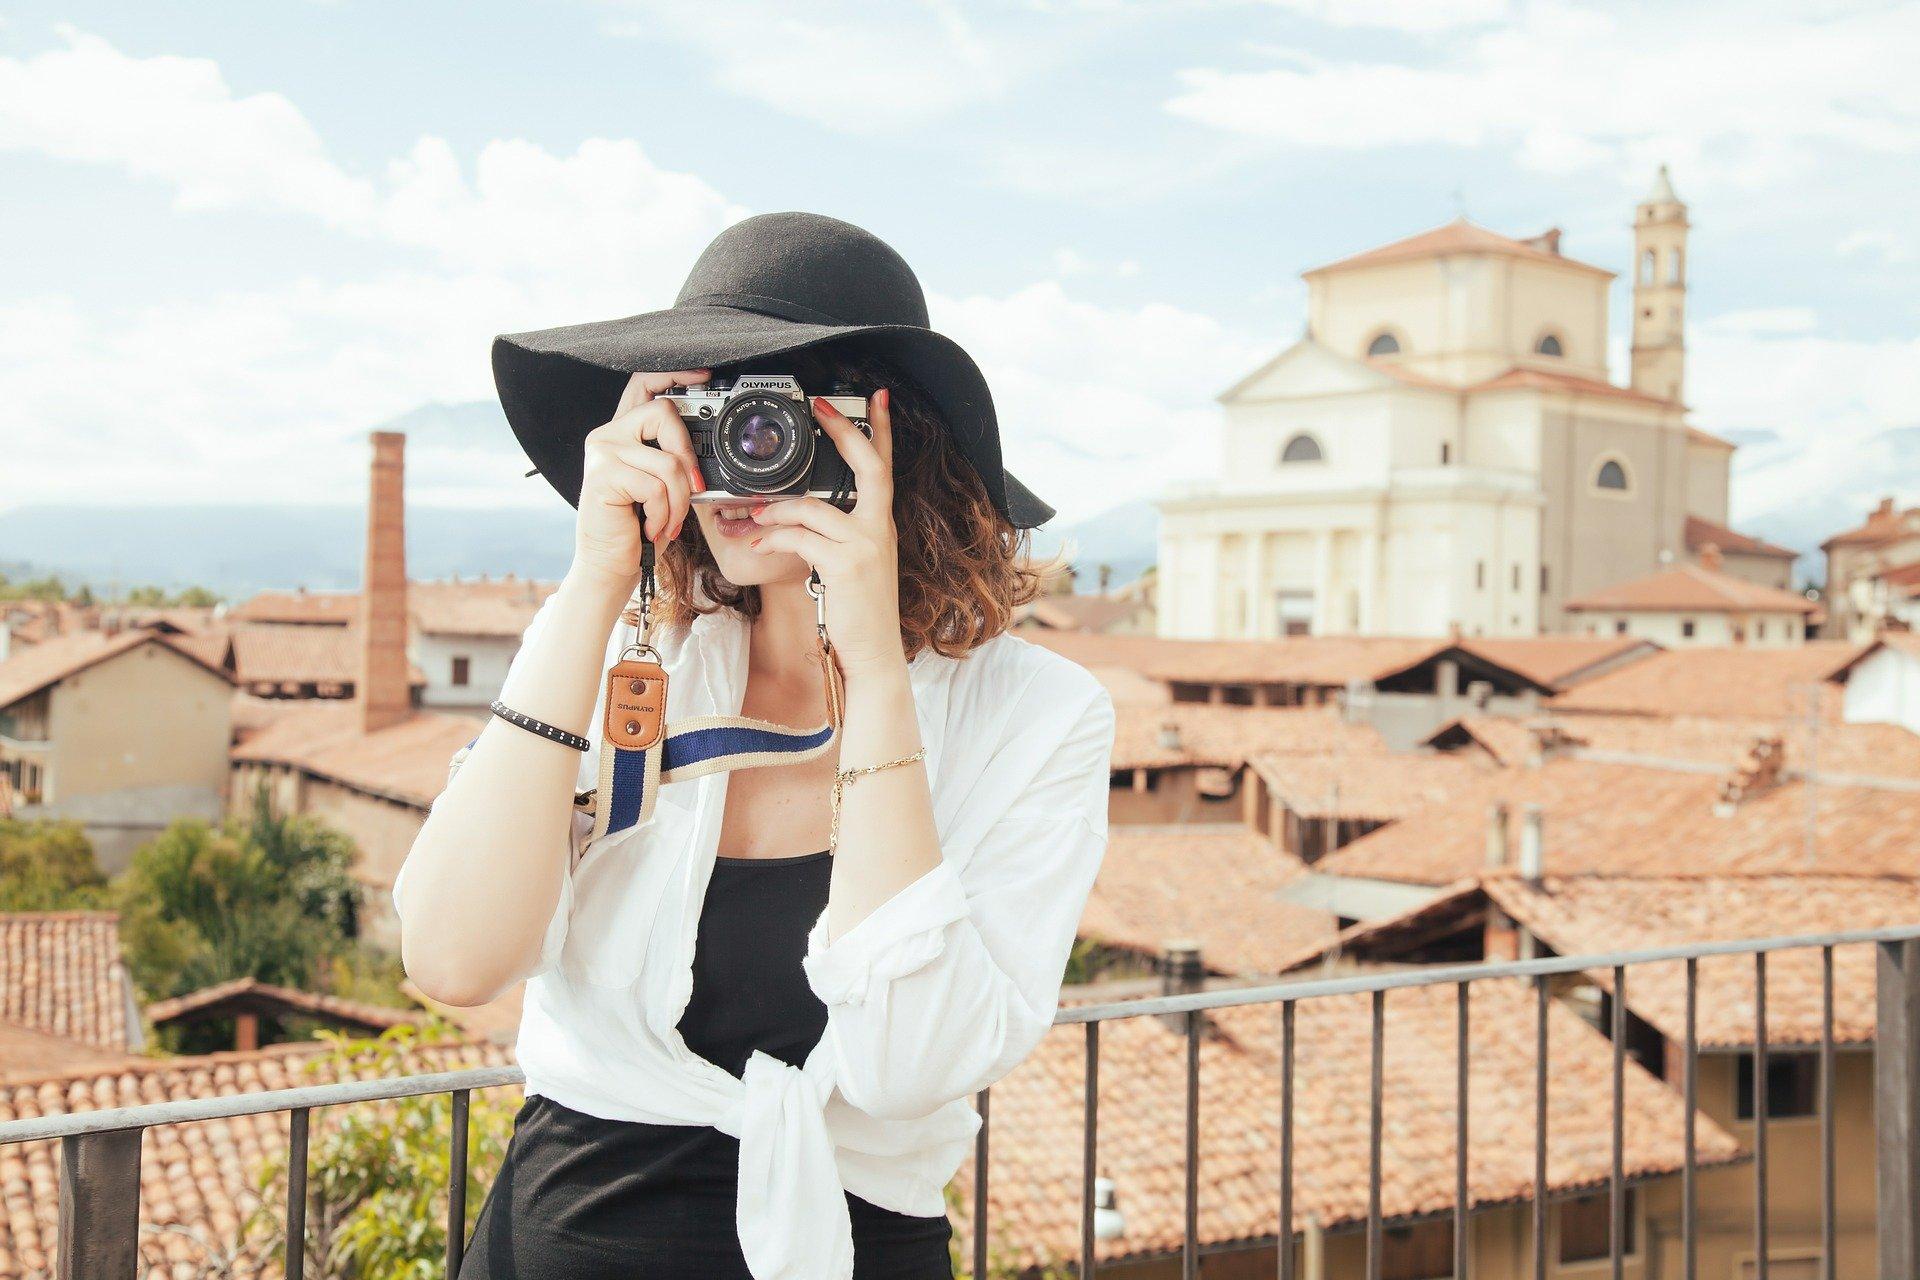 Macchina fotografica o Smartphone?